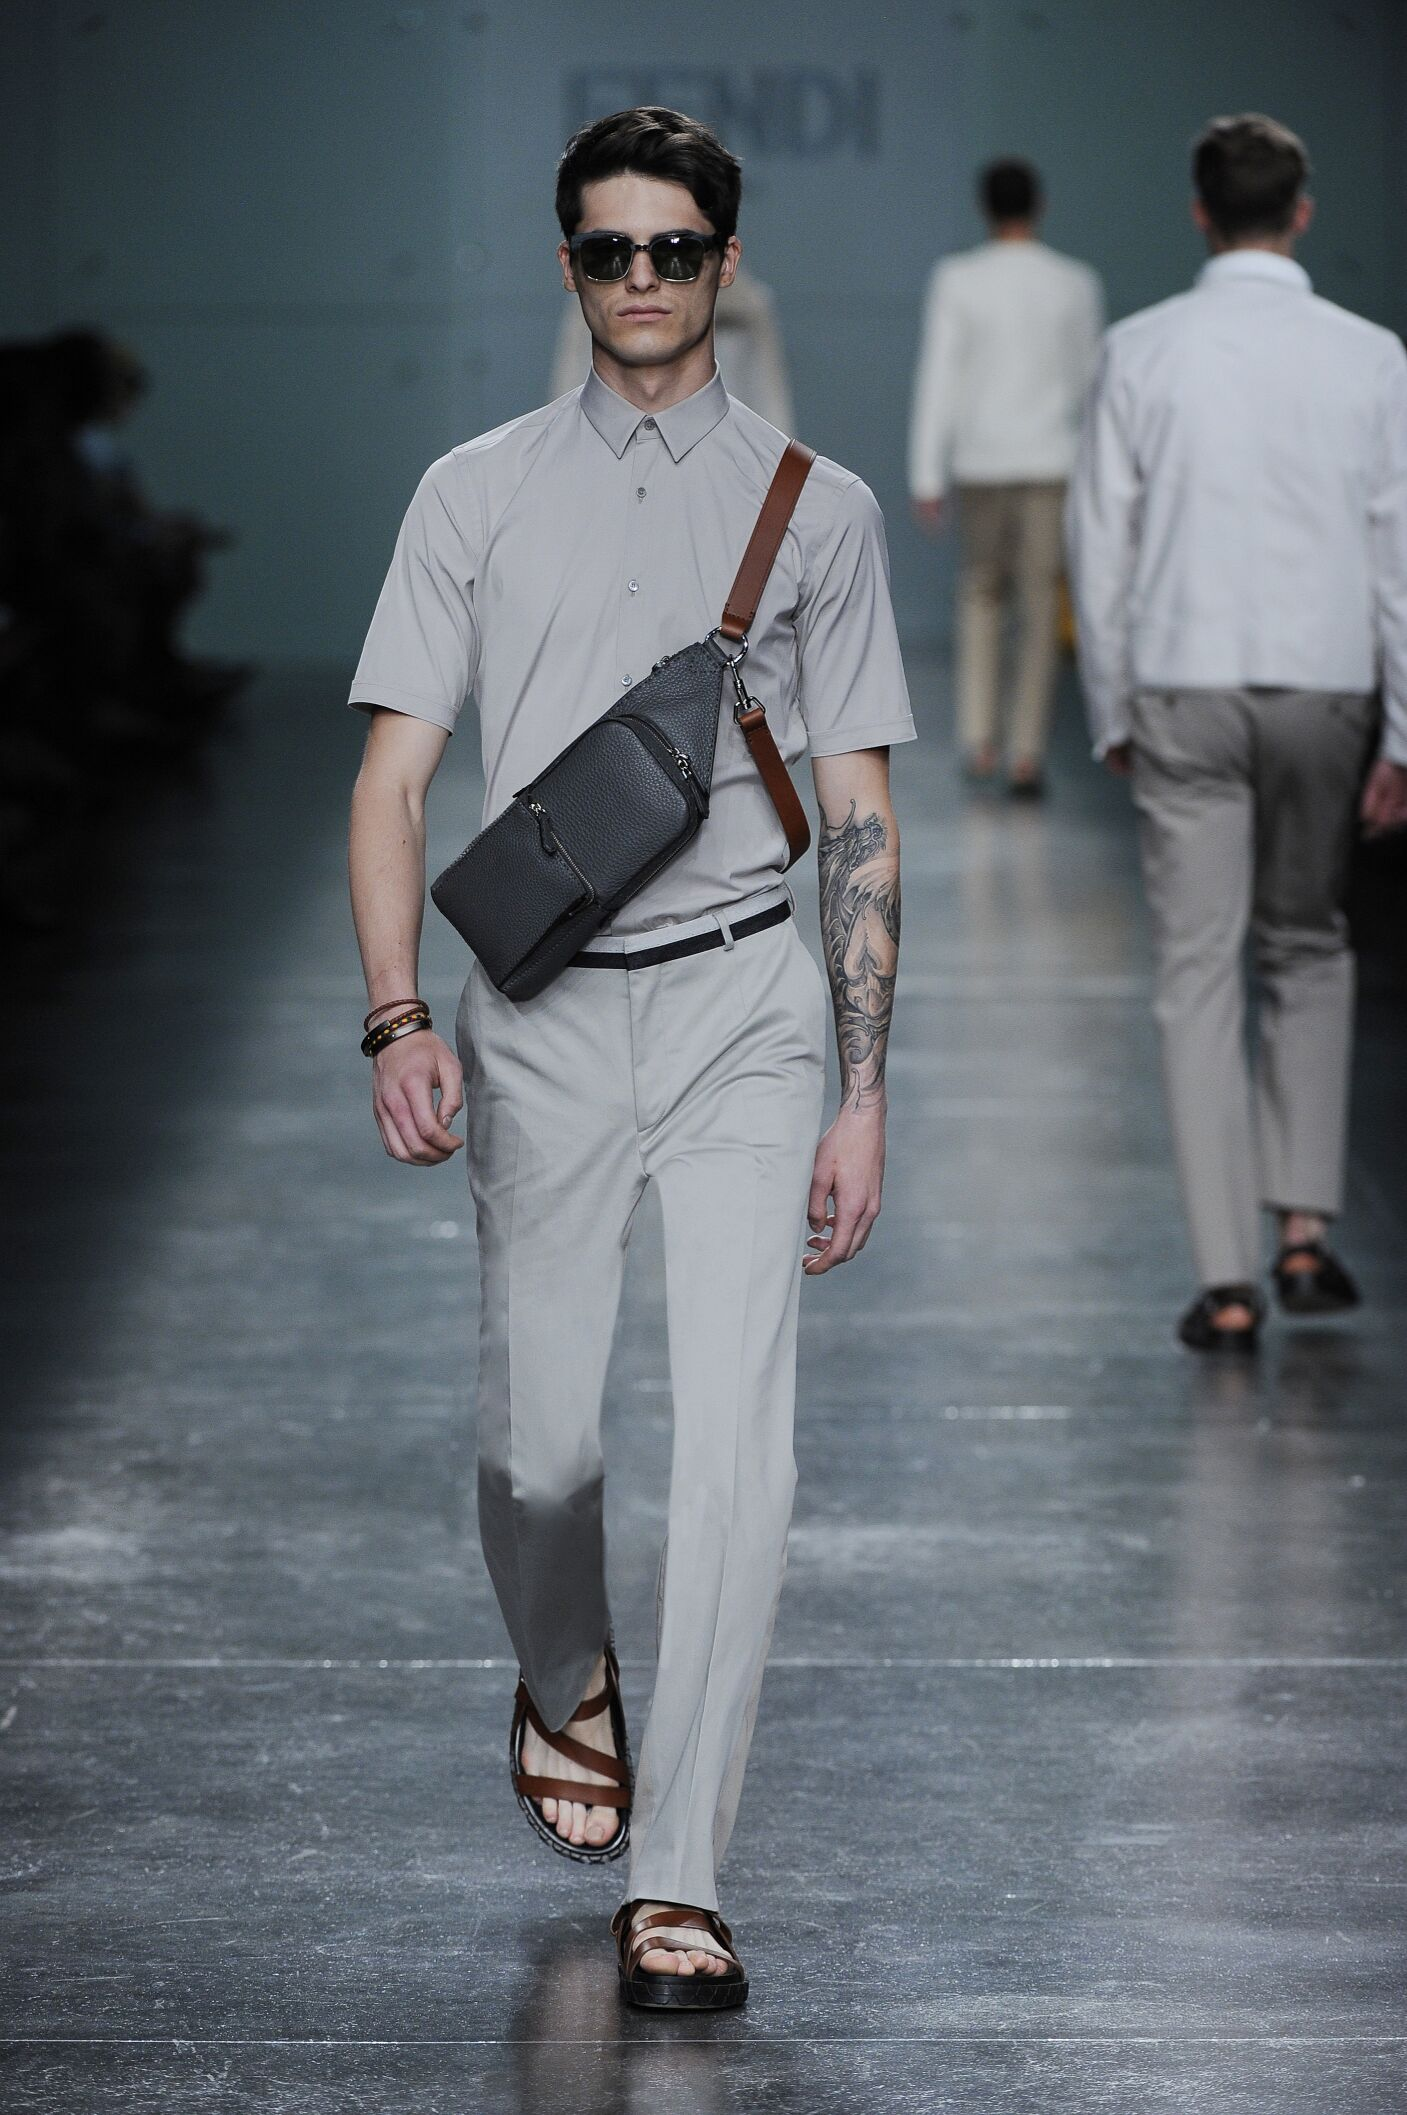 Fendi Man Style